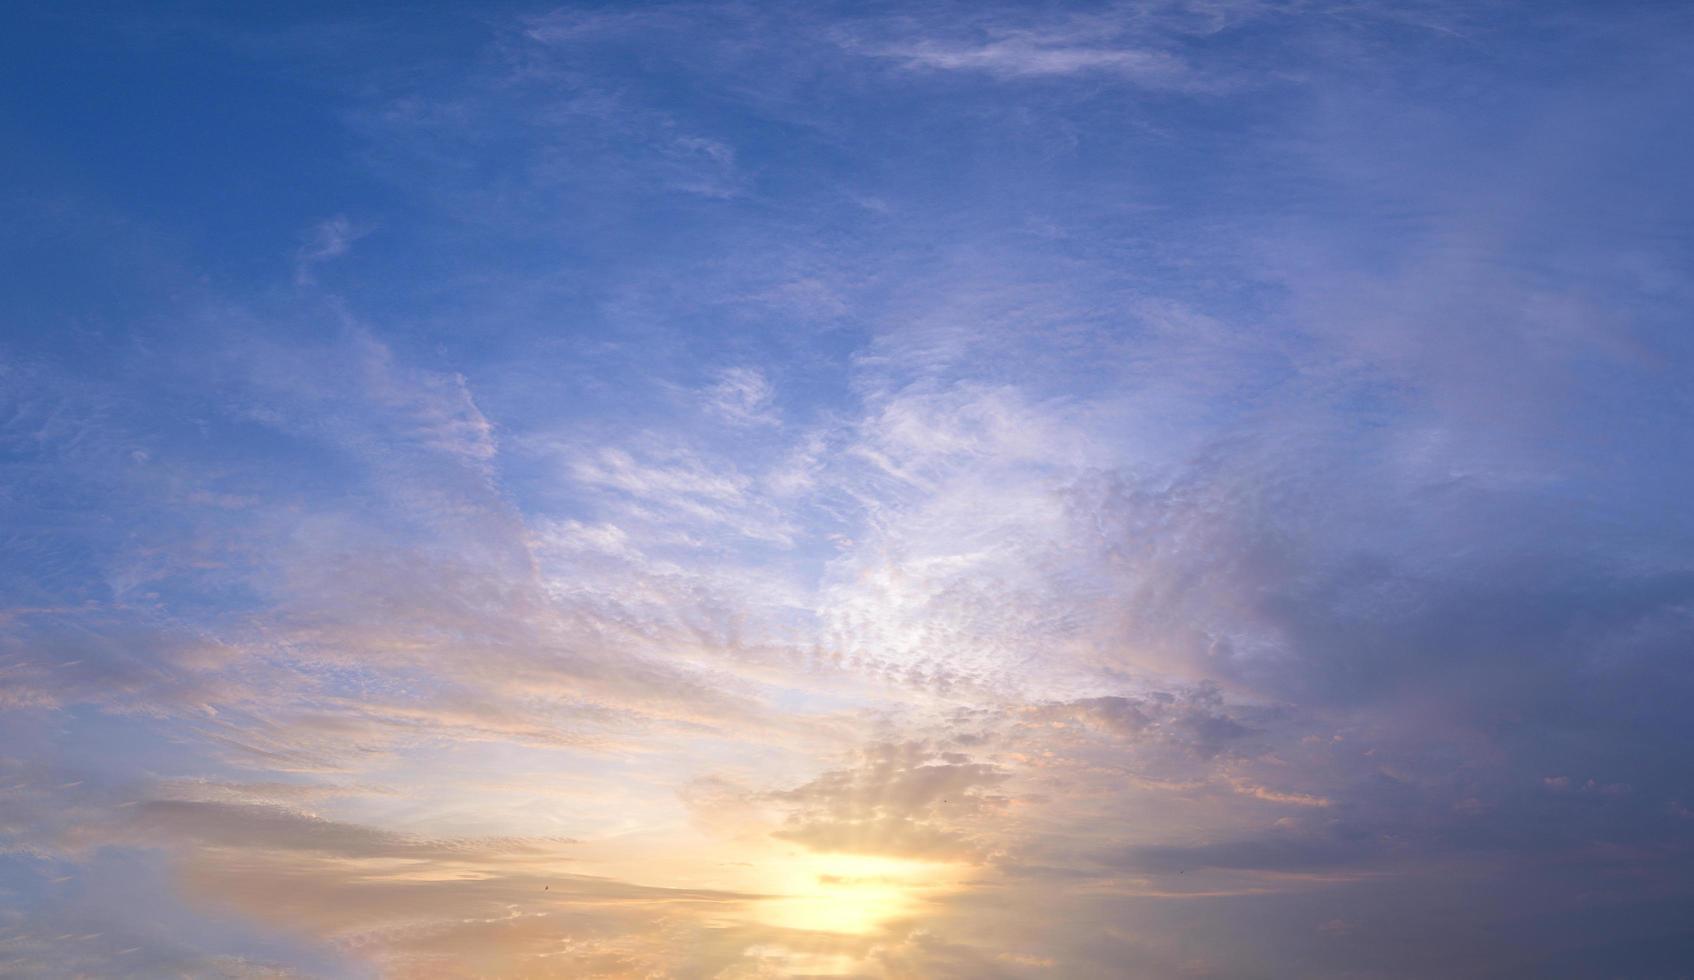 Himmel und Sonne bei Sonnenuntergang foto